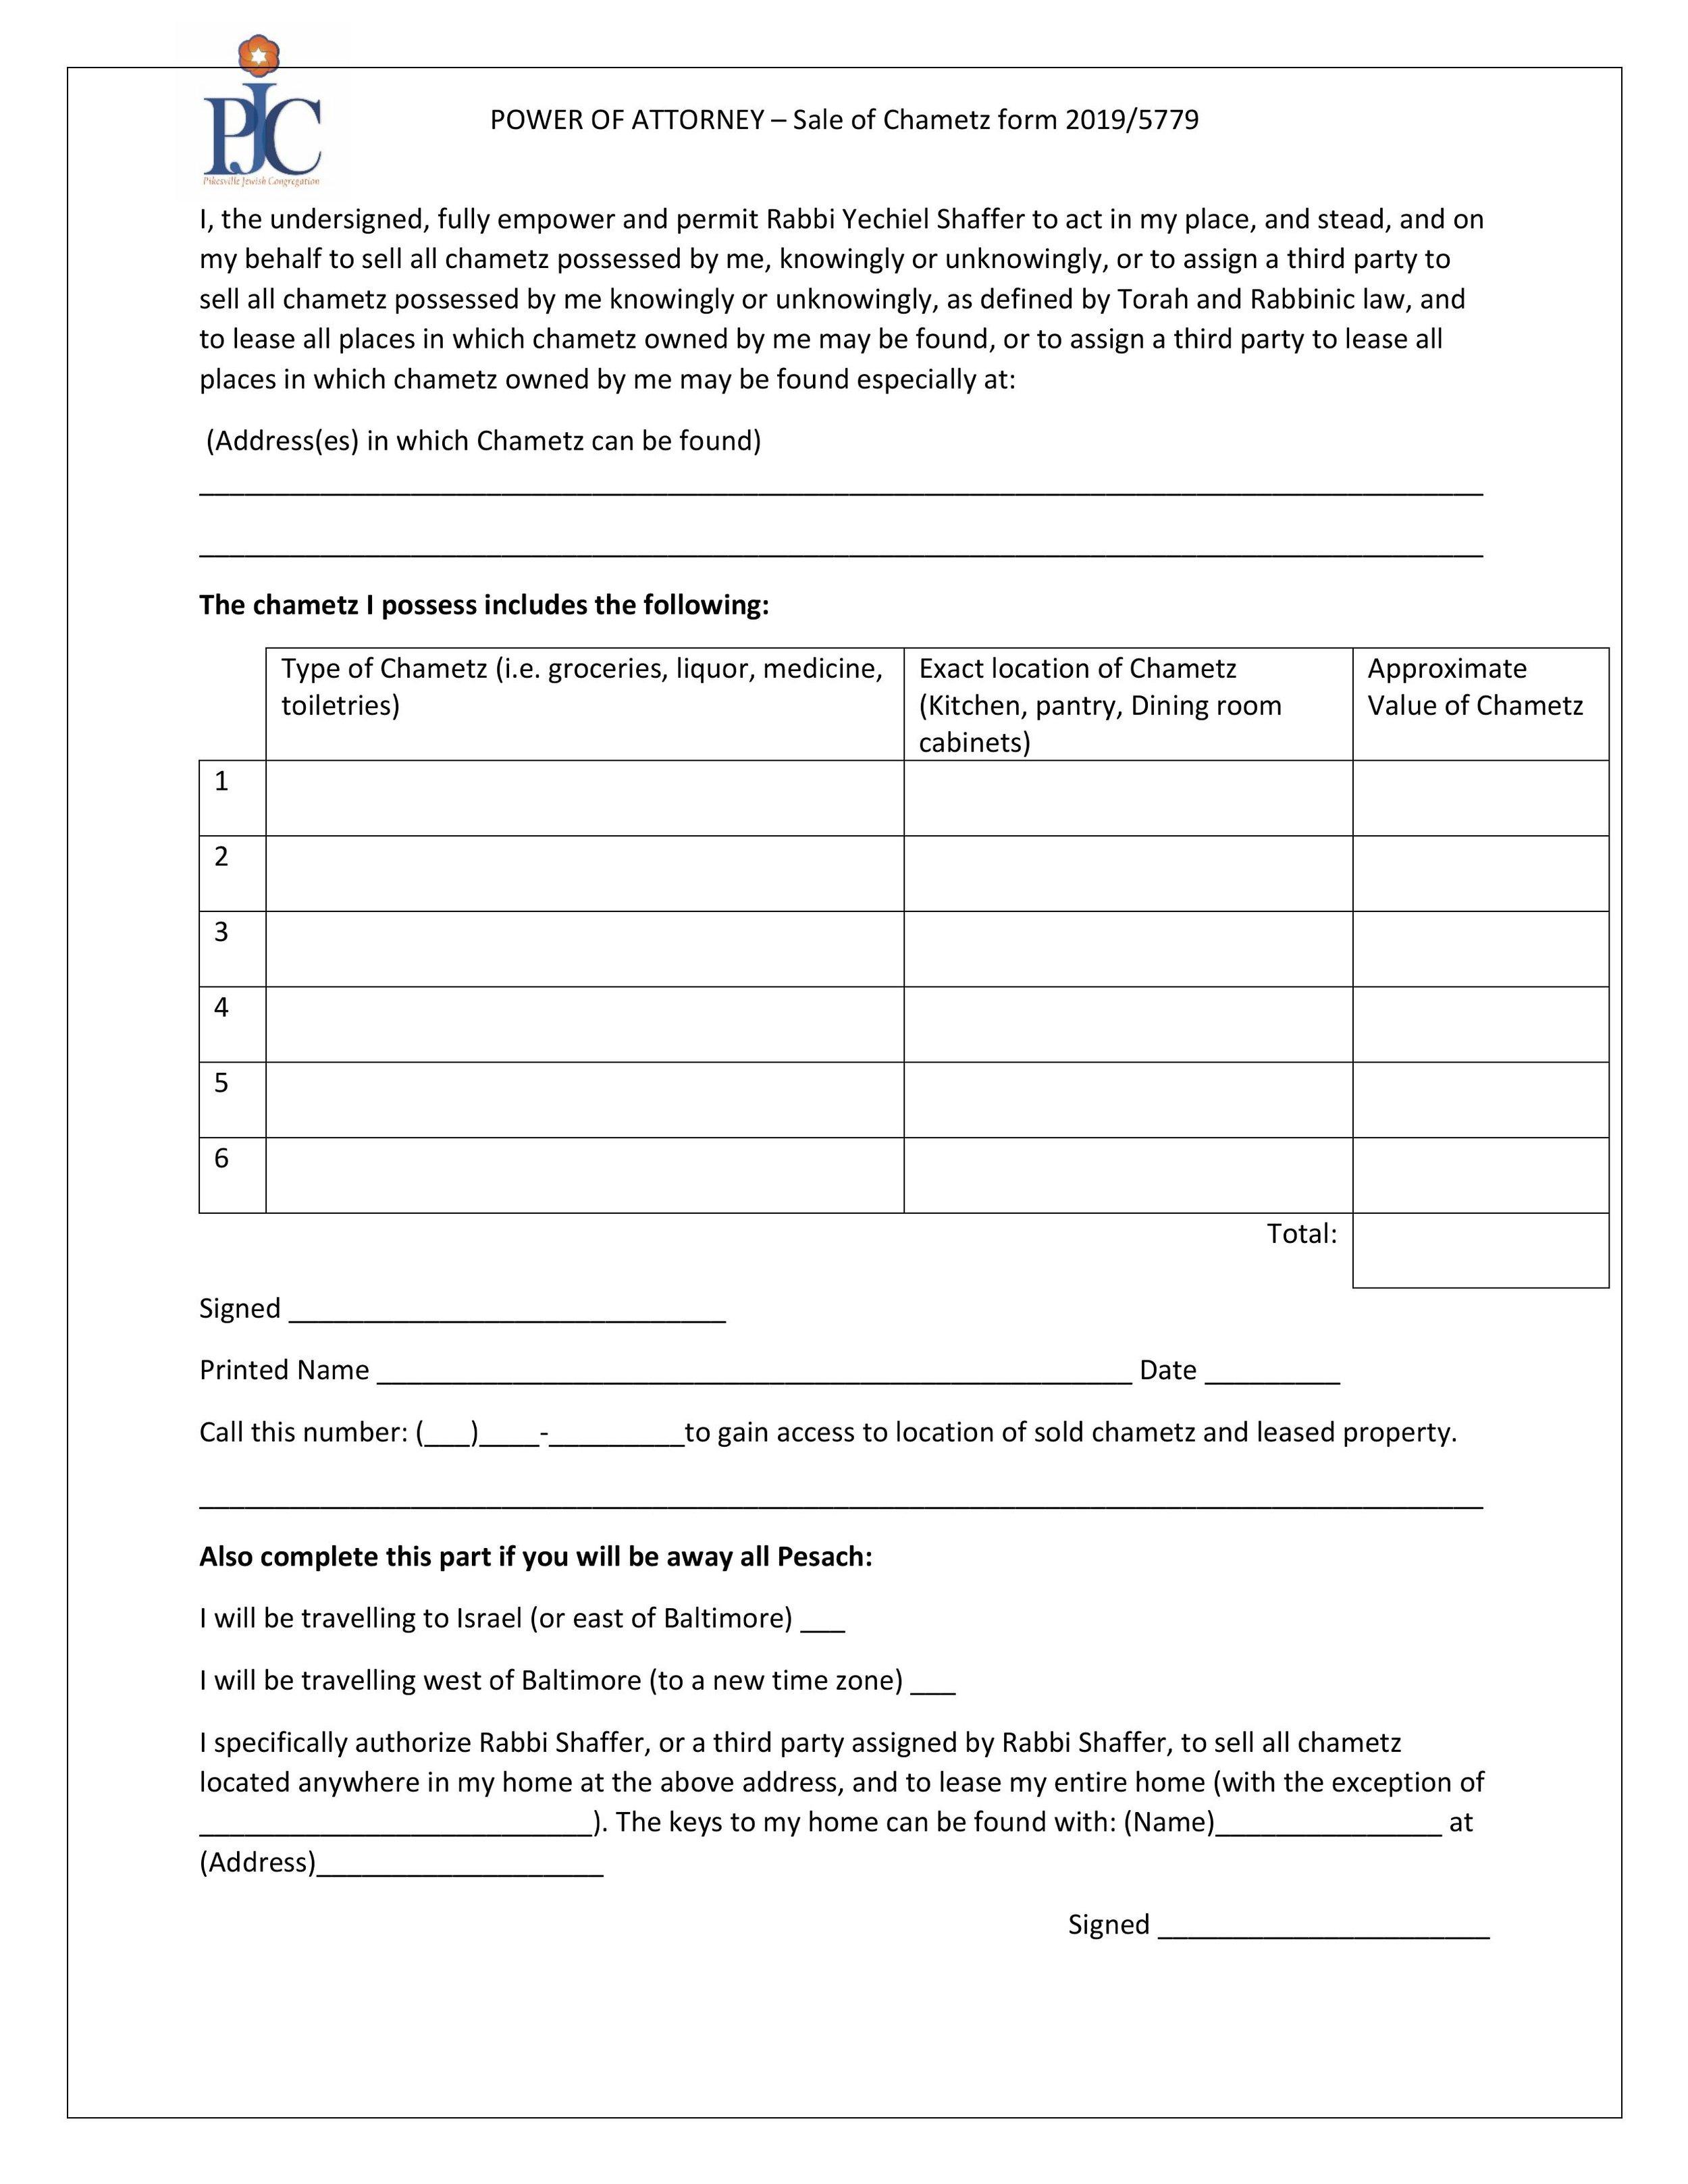 Mechirat Chametz 2019 Form Picture.jpg